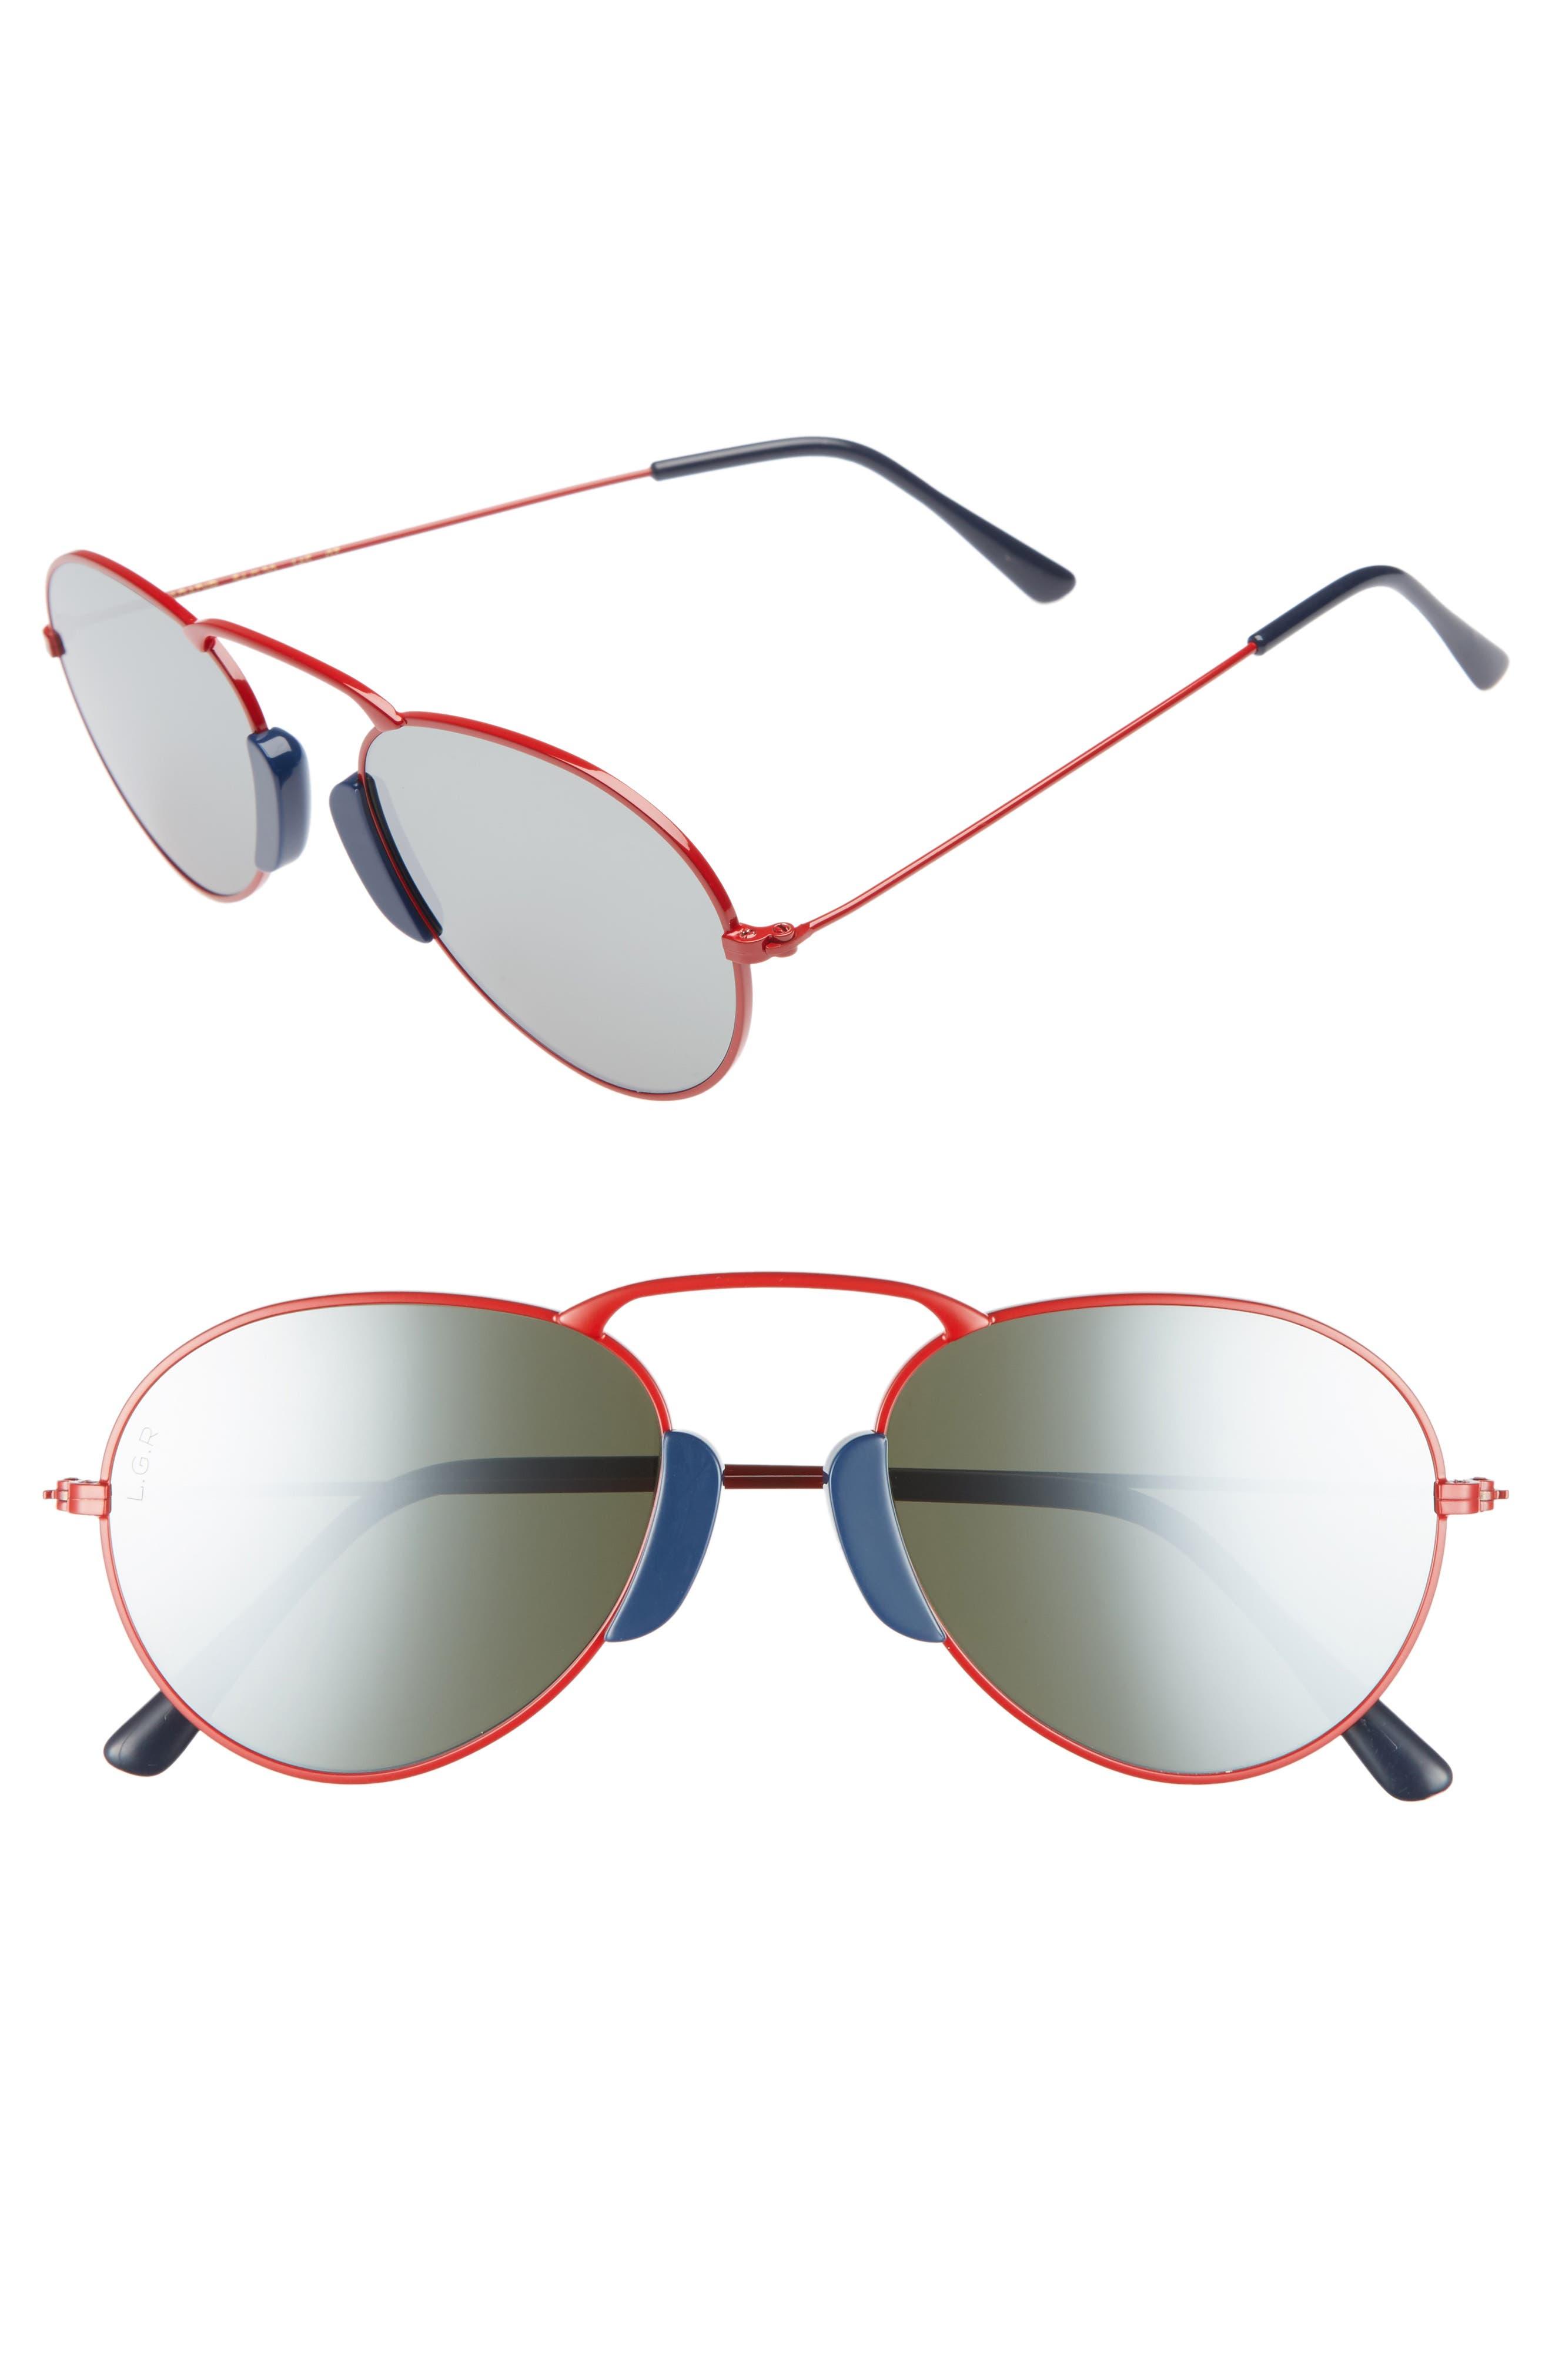 Agadir 54mm Sunglasses,                         Main,                         color, Red/ Silver Mirror